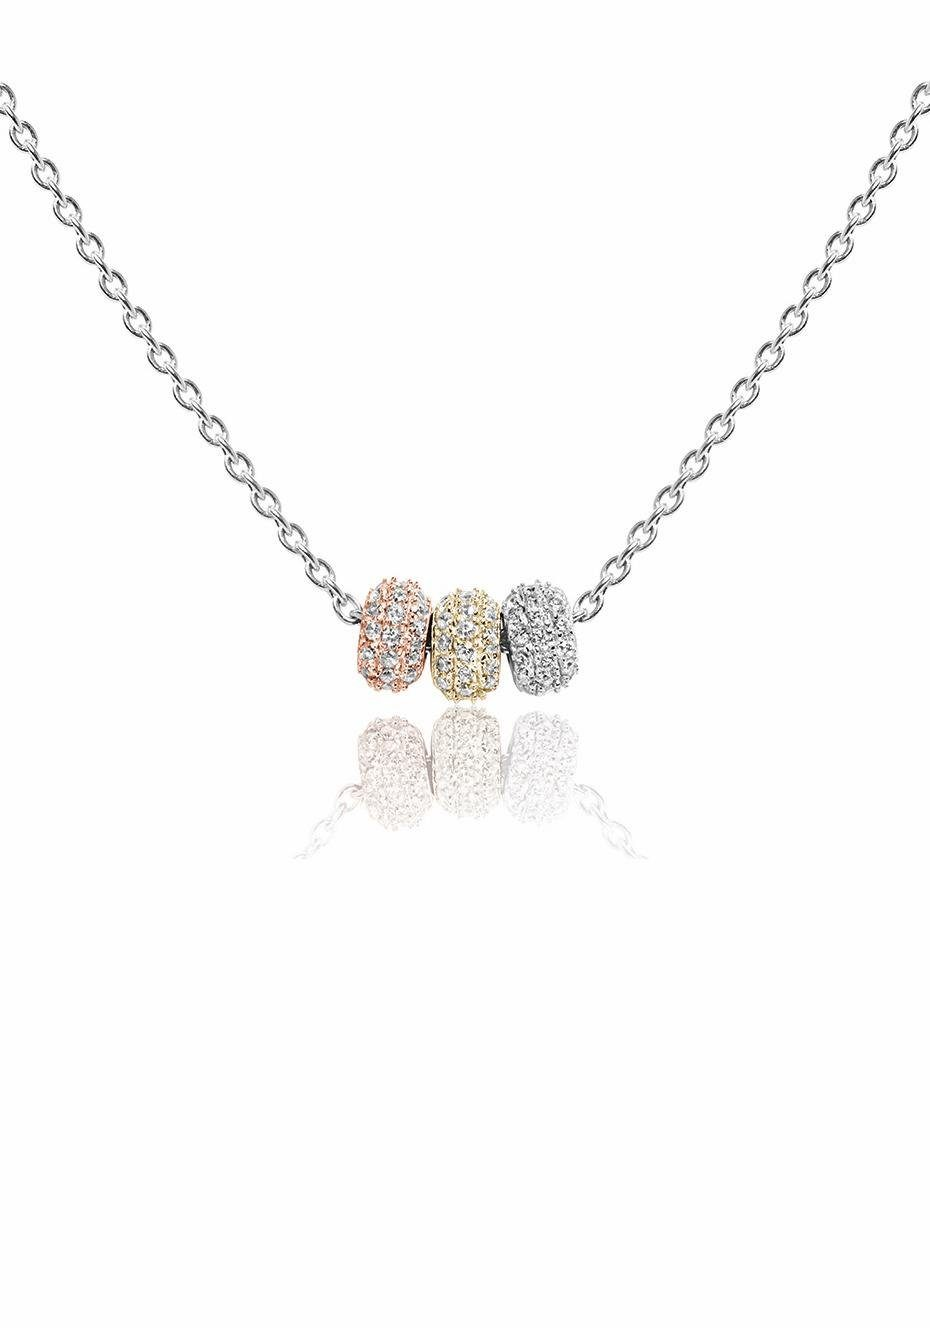 Sif Jakobs Jewellery Kette mit Anhänger »LARIANO, SJ-C0159-CZ(SRY)« mit Zirkonia